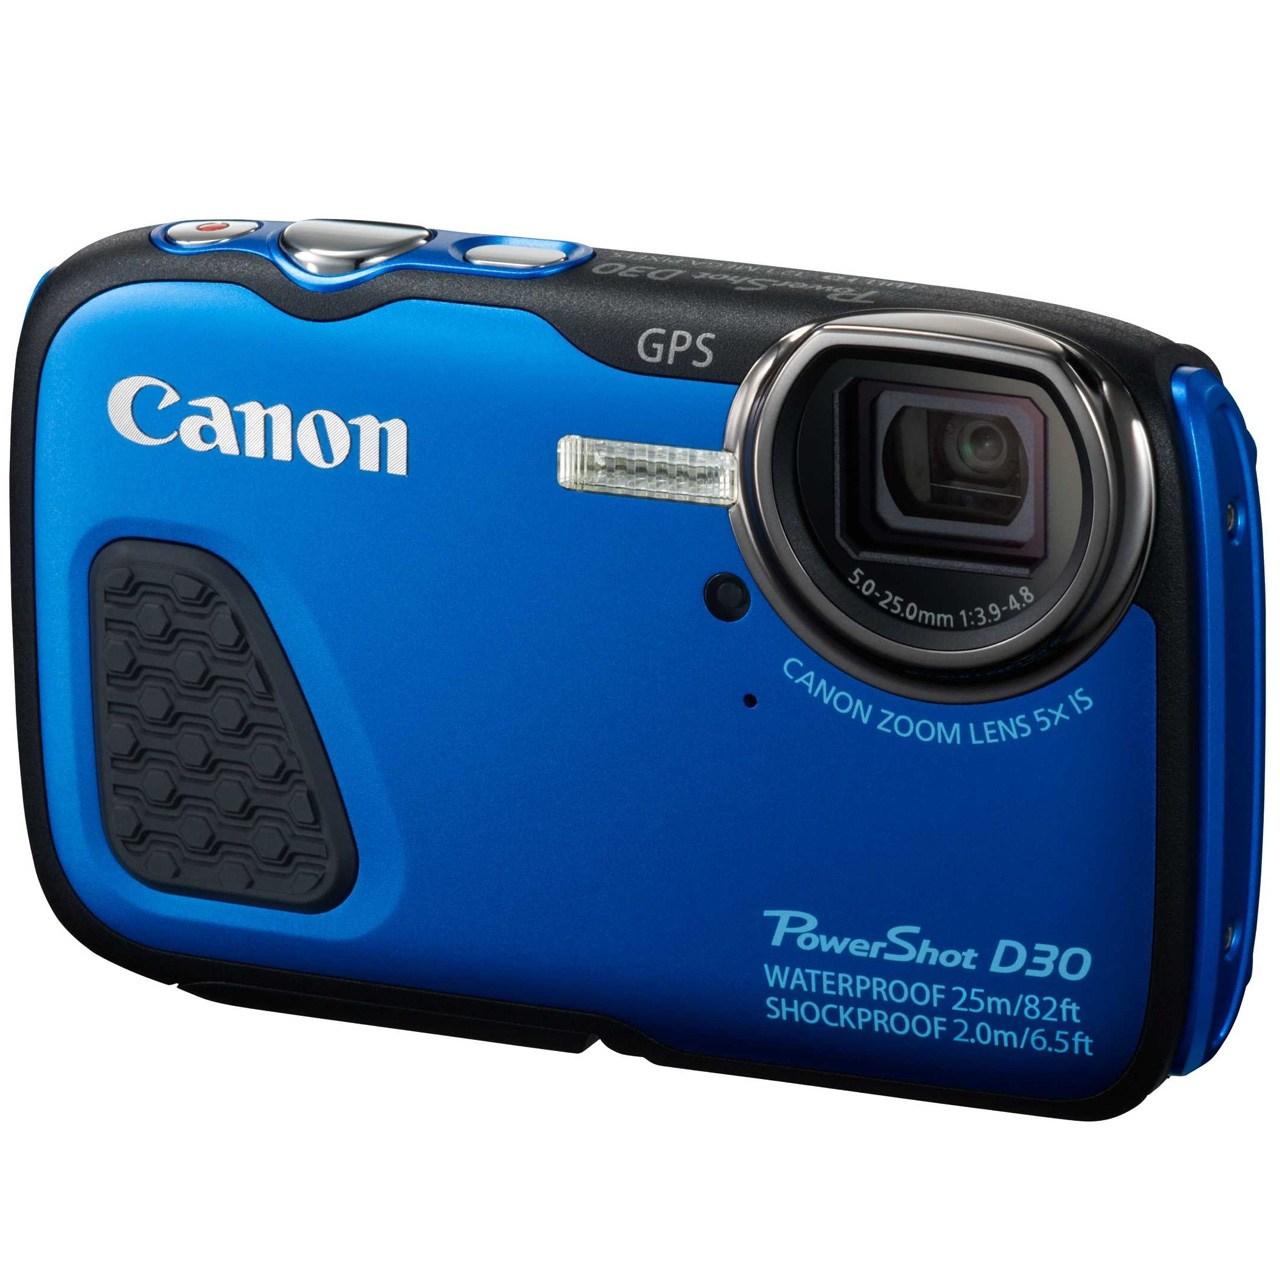 دوربین دیجیتال کانن مدل PowerShot D30